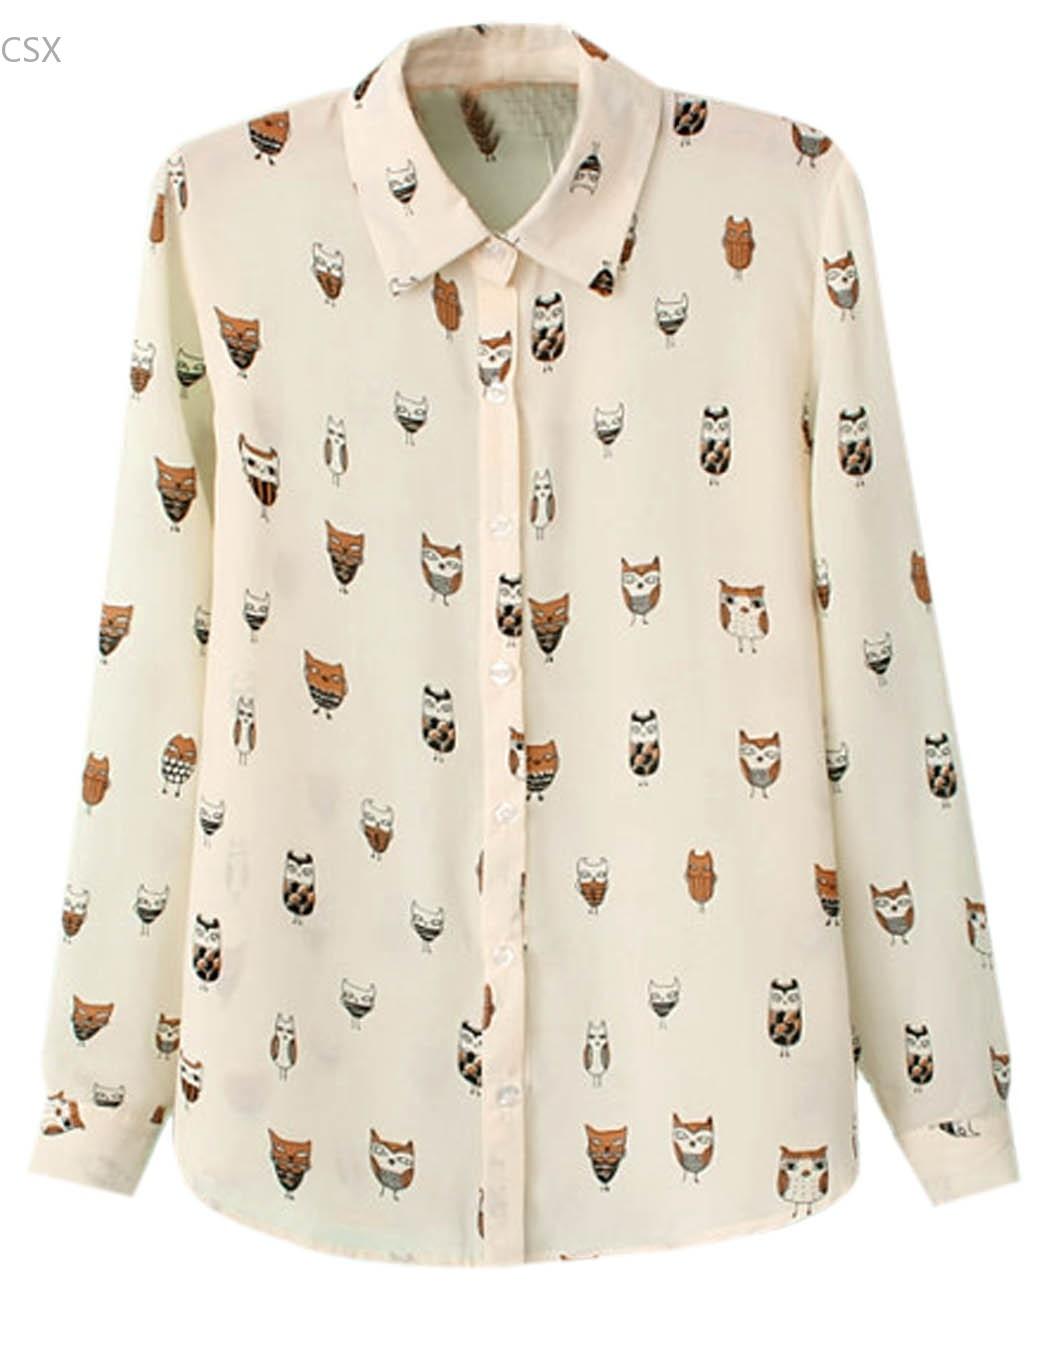 Freeshipping New Women Shirt Female Trendy Collar Owl Print Long Sleeve Chiffon Blouse Tops Blusa Feminina 4 Sizes SV11